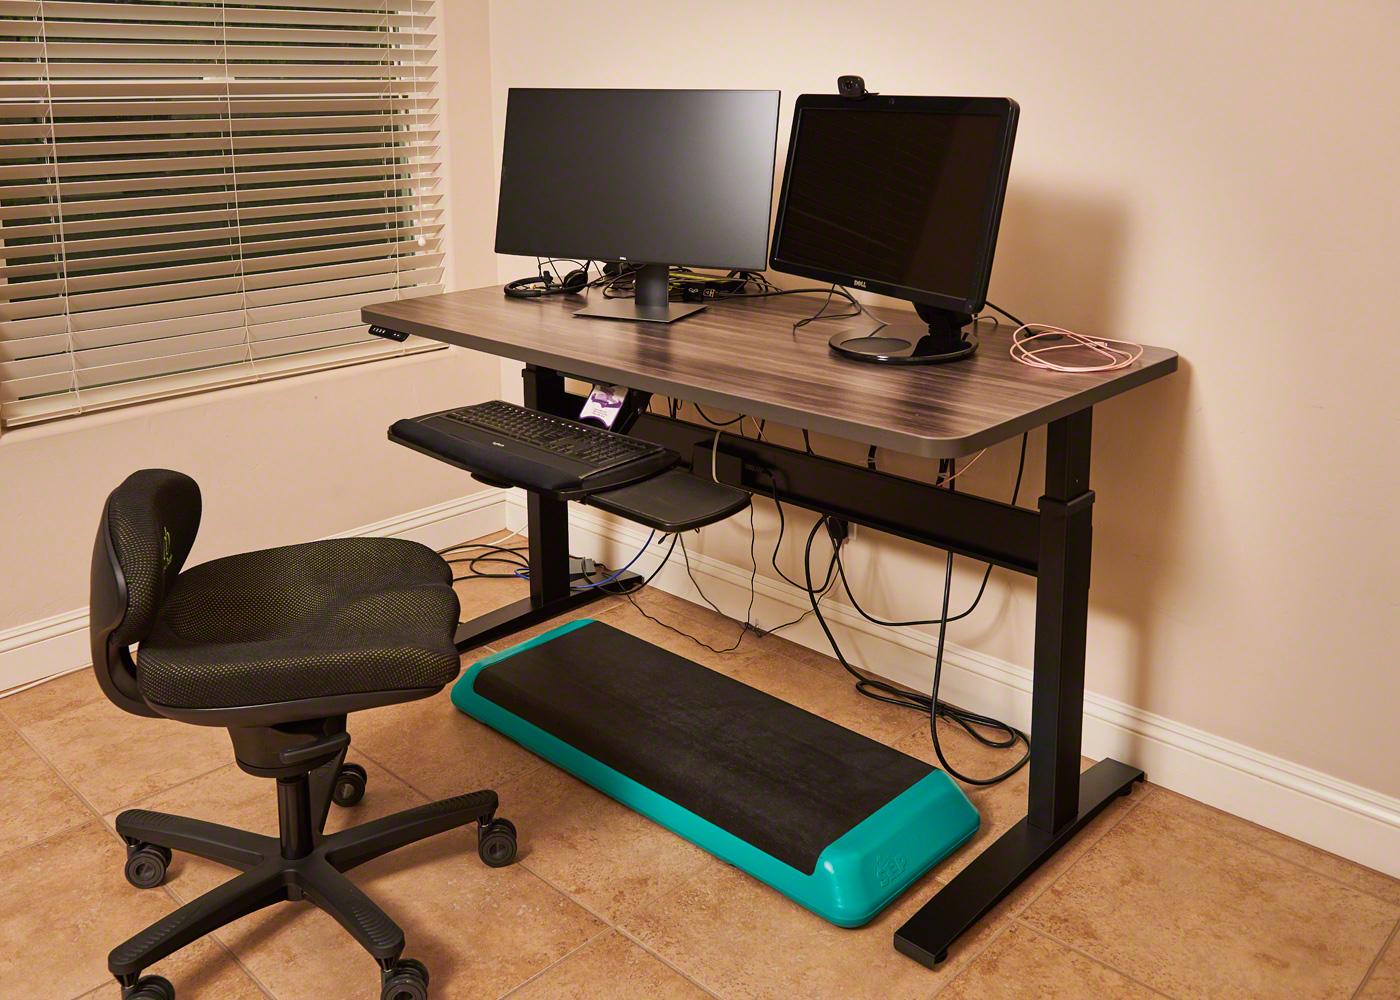 "30"" x 60"" Merapi Radius Corner Laminate Top with Black VertDesk Standing Desk Frame"